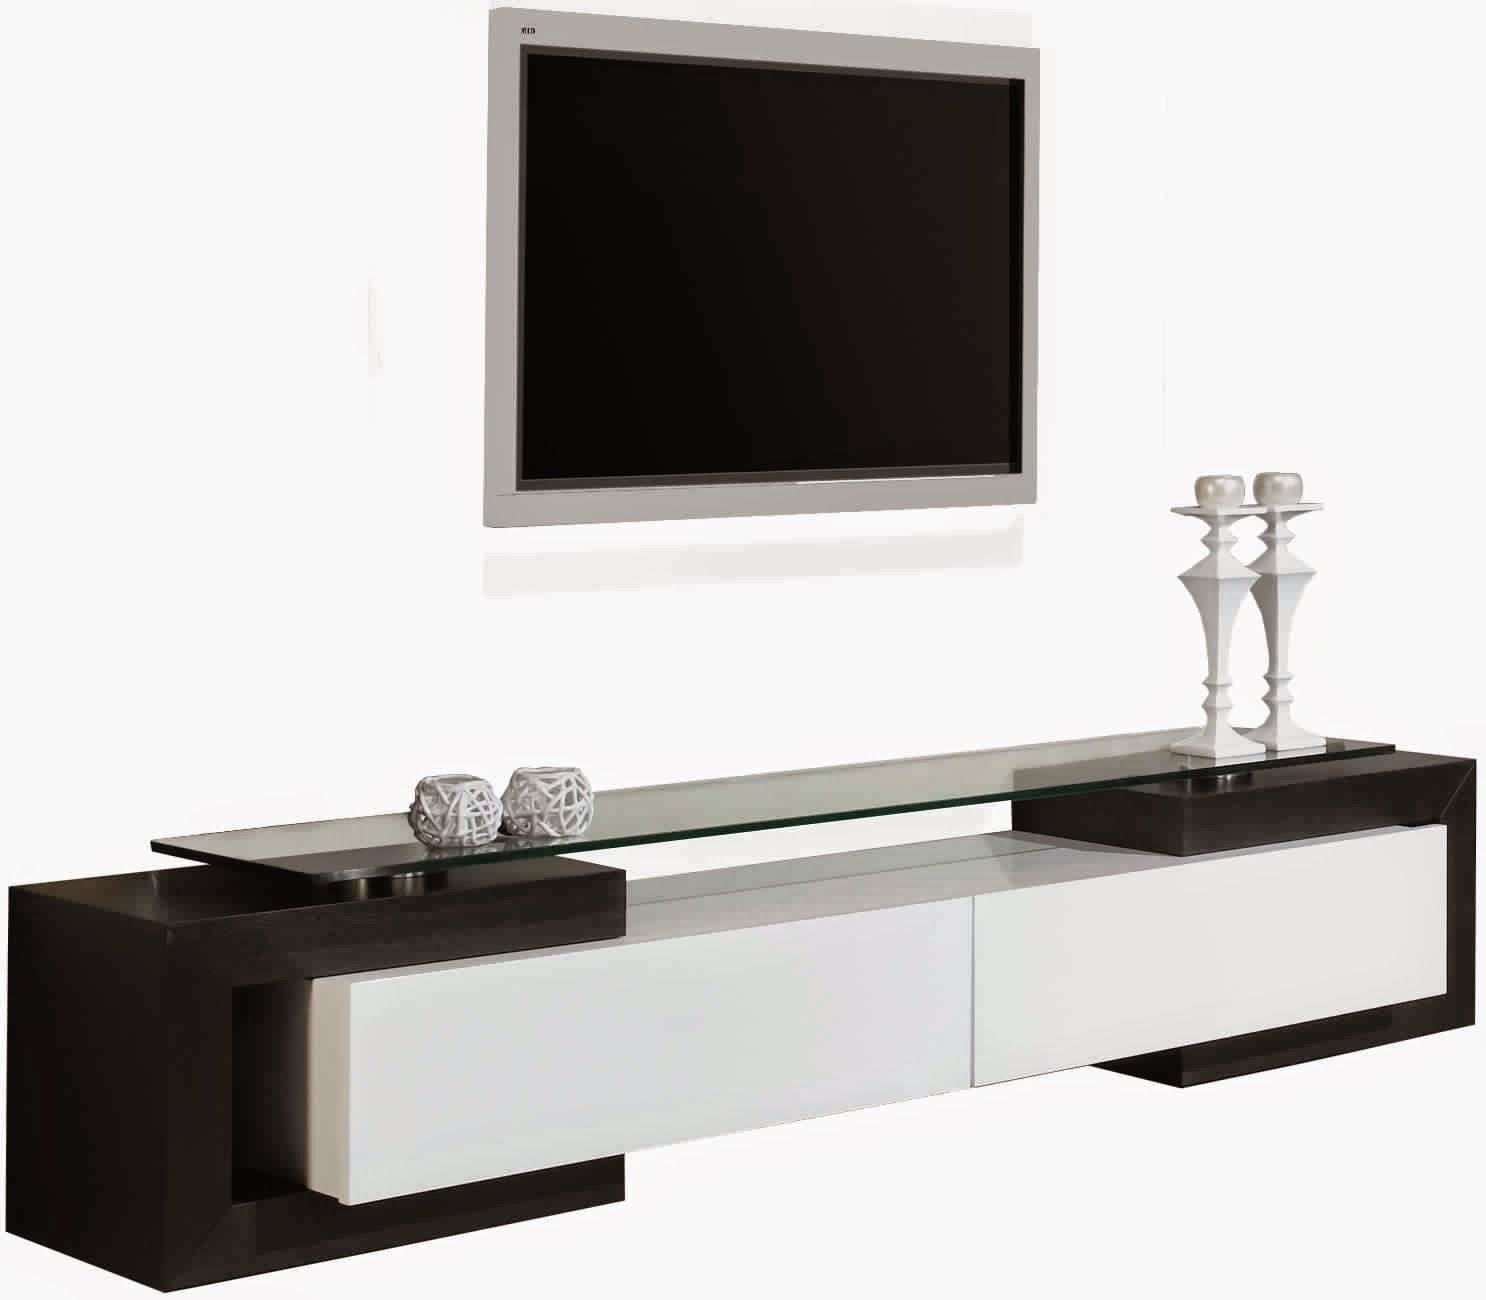 Beau Meuble Tv Noir Blanc D Coration Fran Aise Pinterest  # Meuble Tv Rotin